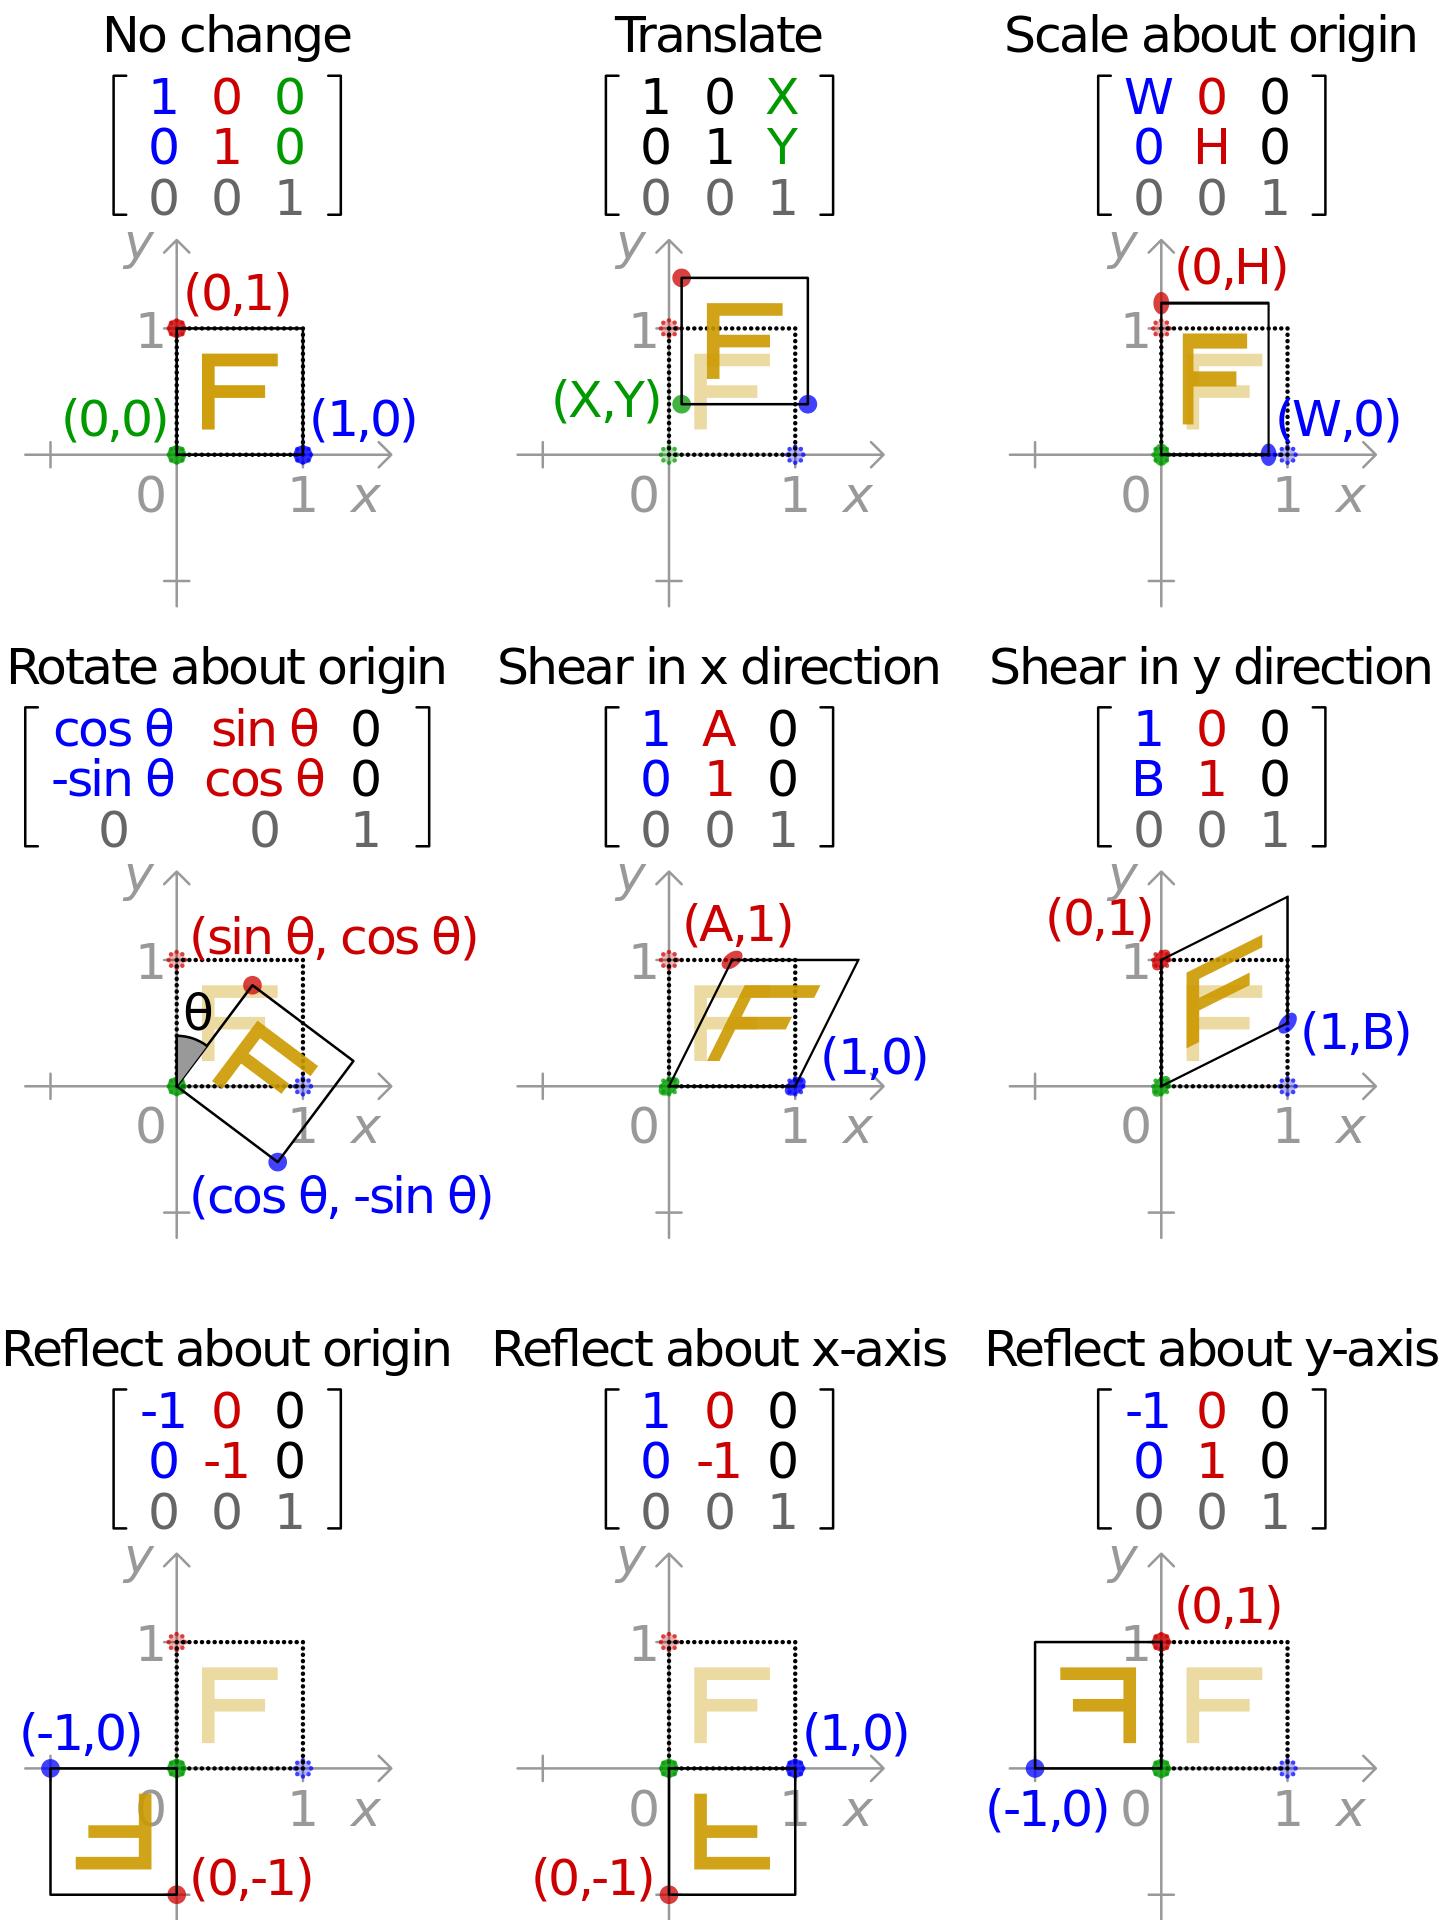 Complex number venn diagram n z q ar r c euler complex number venn diagram n z q ar r c euler venn diagrams pinterest number sets diagram and venn diagrams ccuart Choice Image